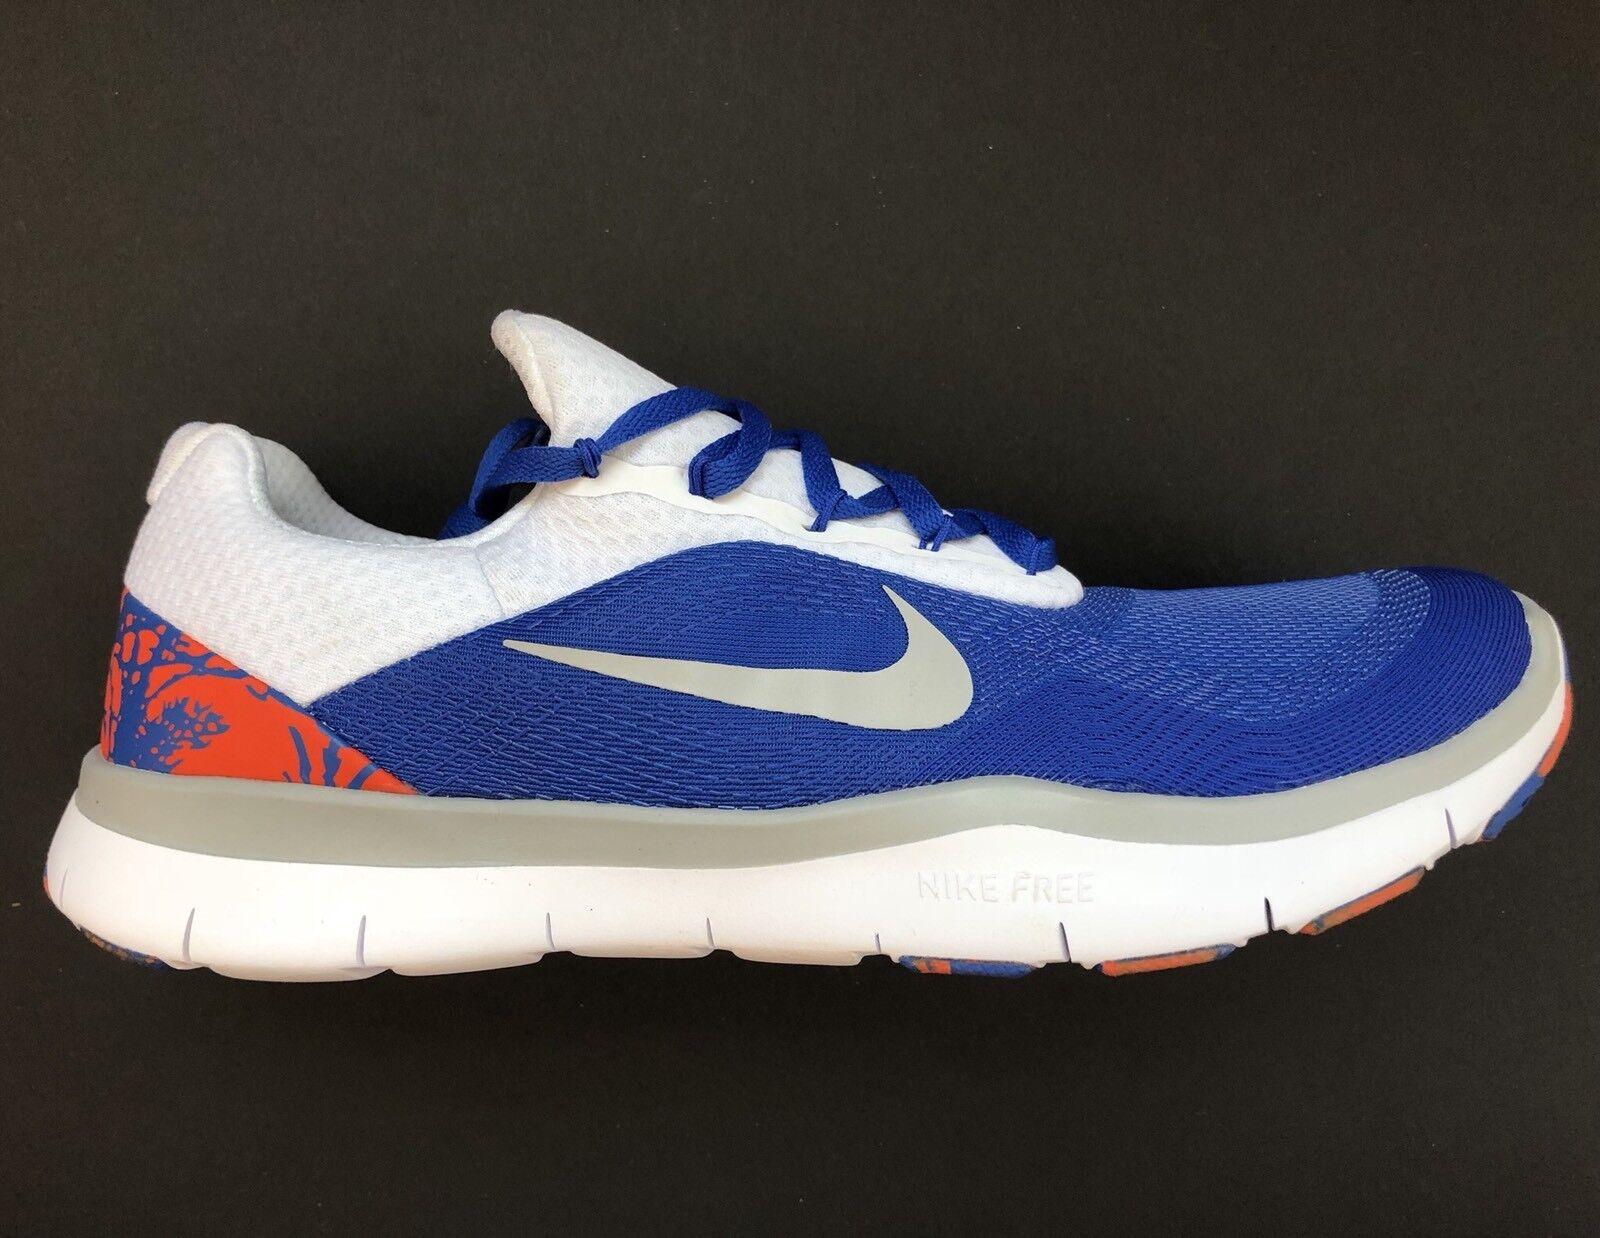 Nike Florida Gators Free Trainer V7 Week Zero Shoes AA0881-401 Size Men's 13